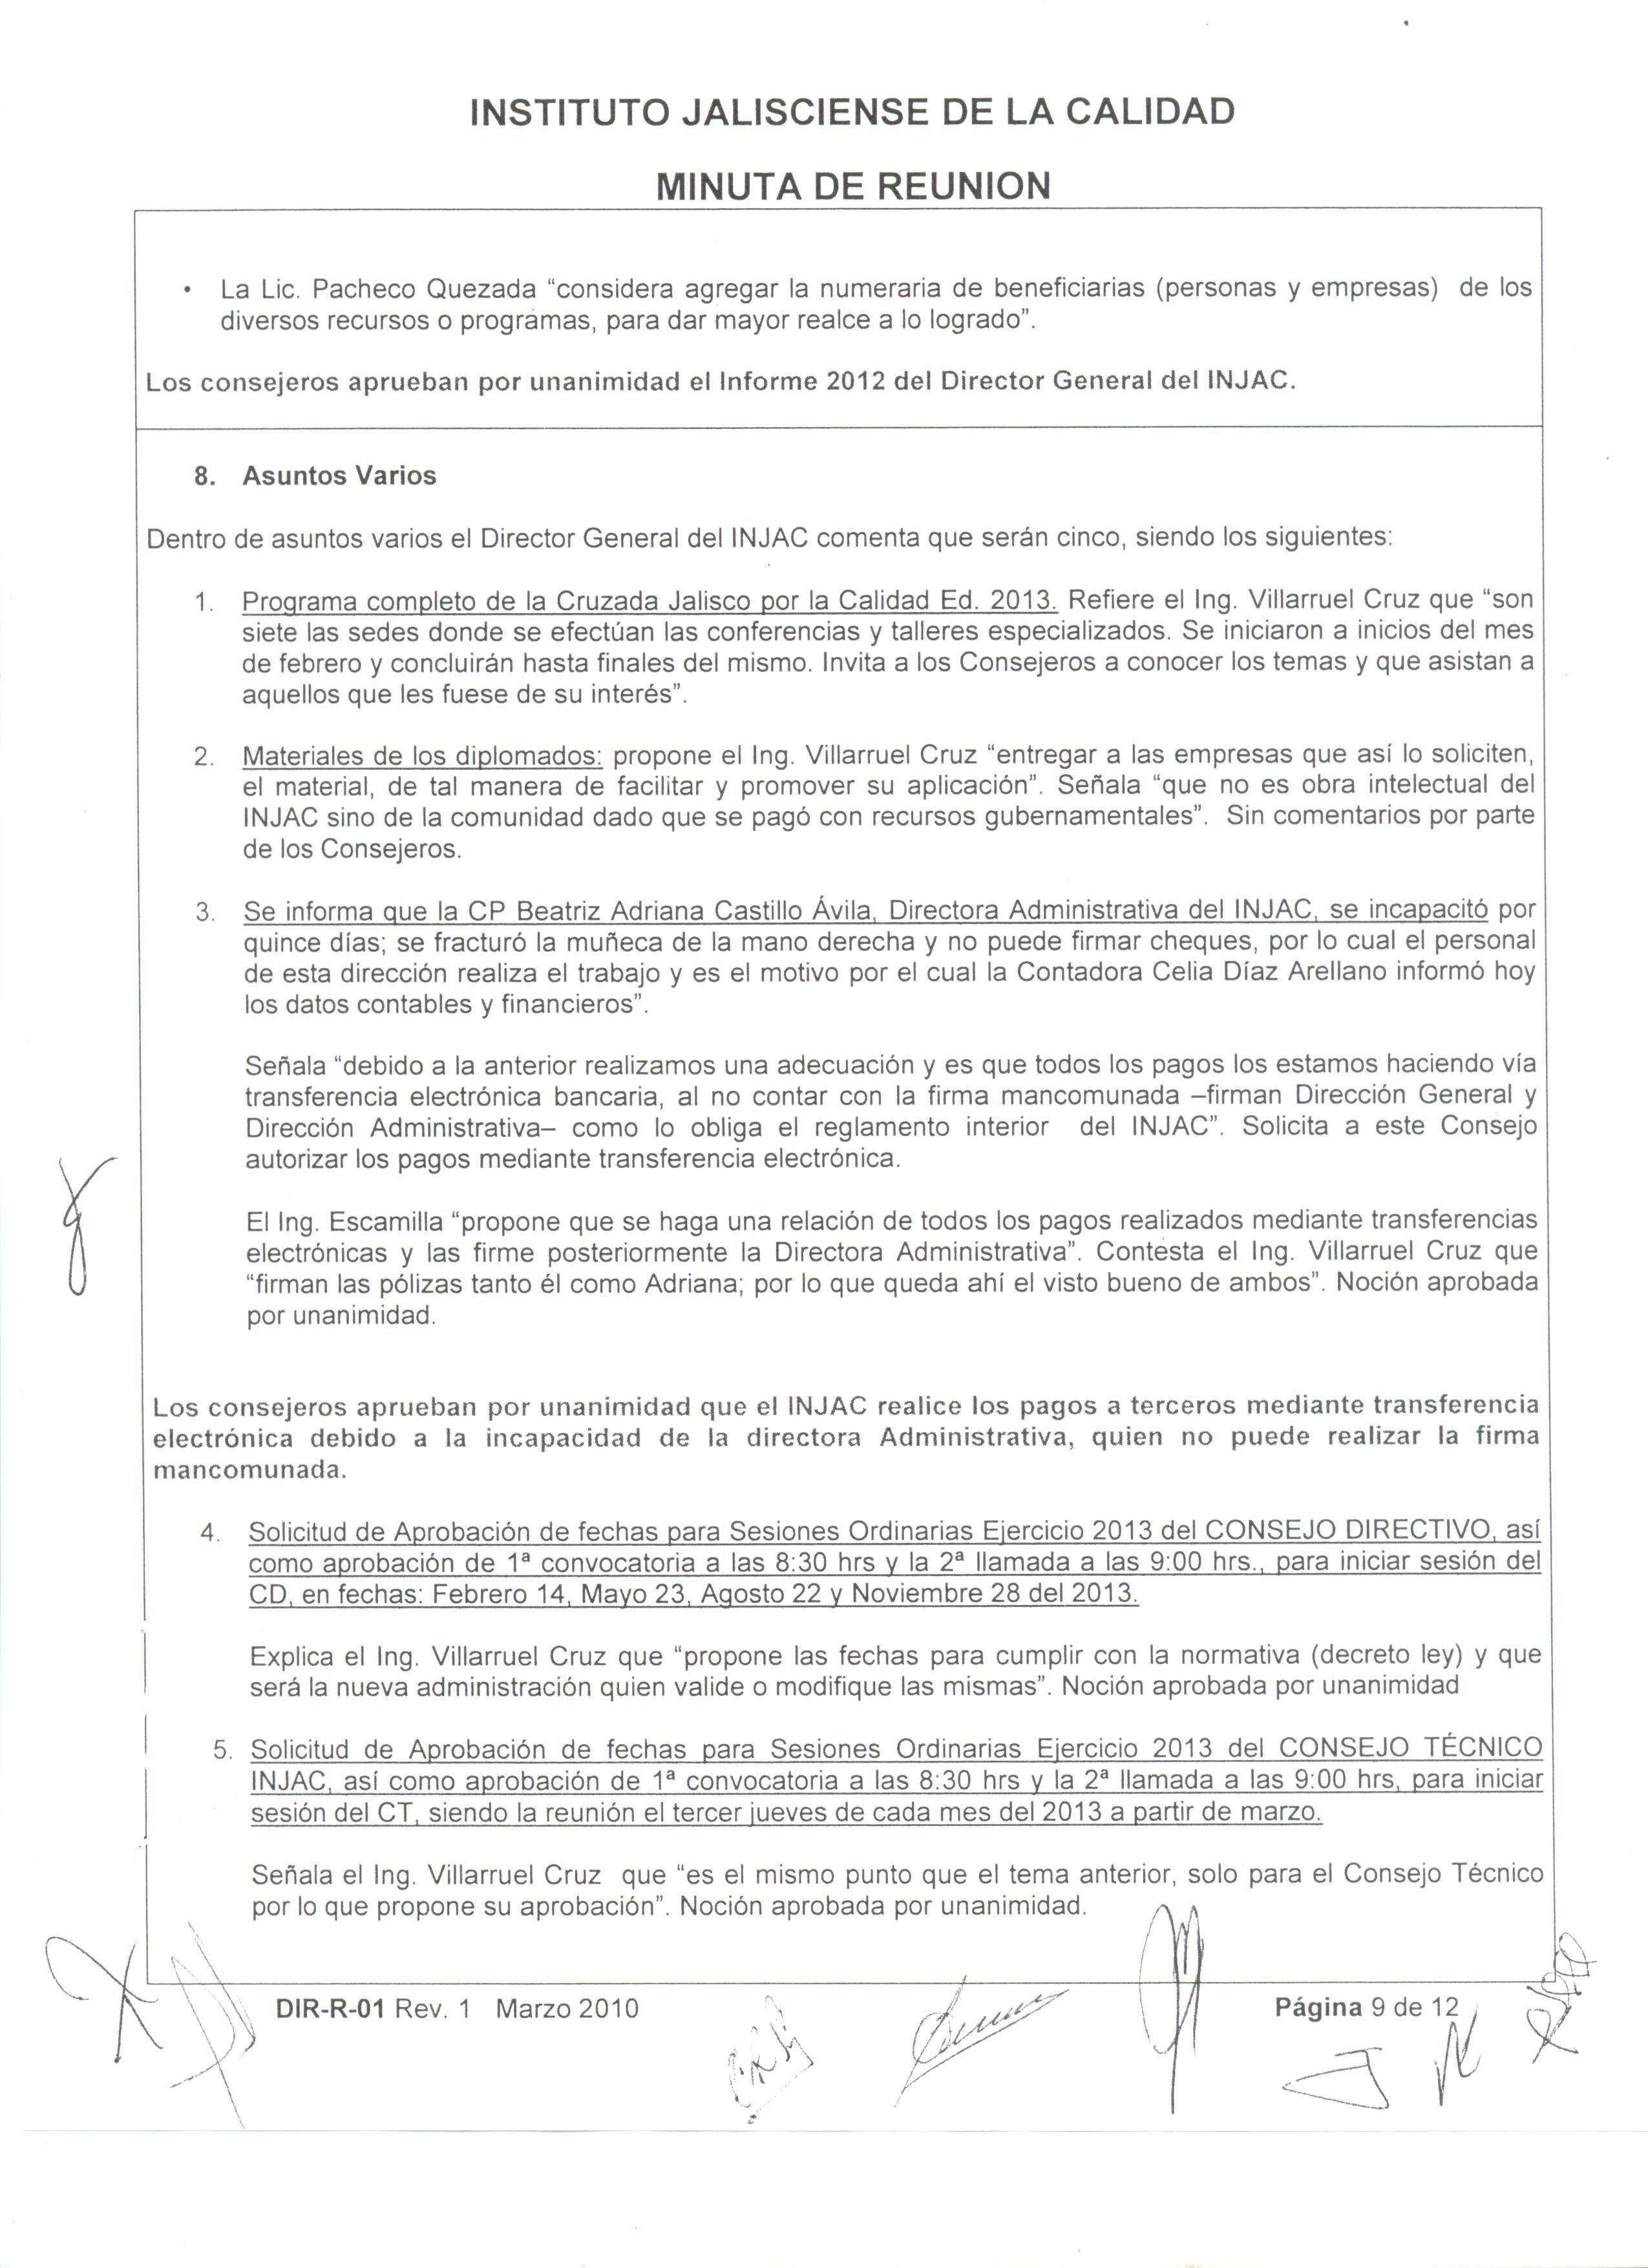 principles of criminal law bronitt pdf